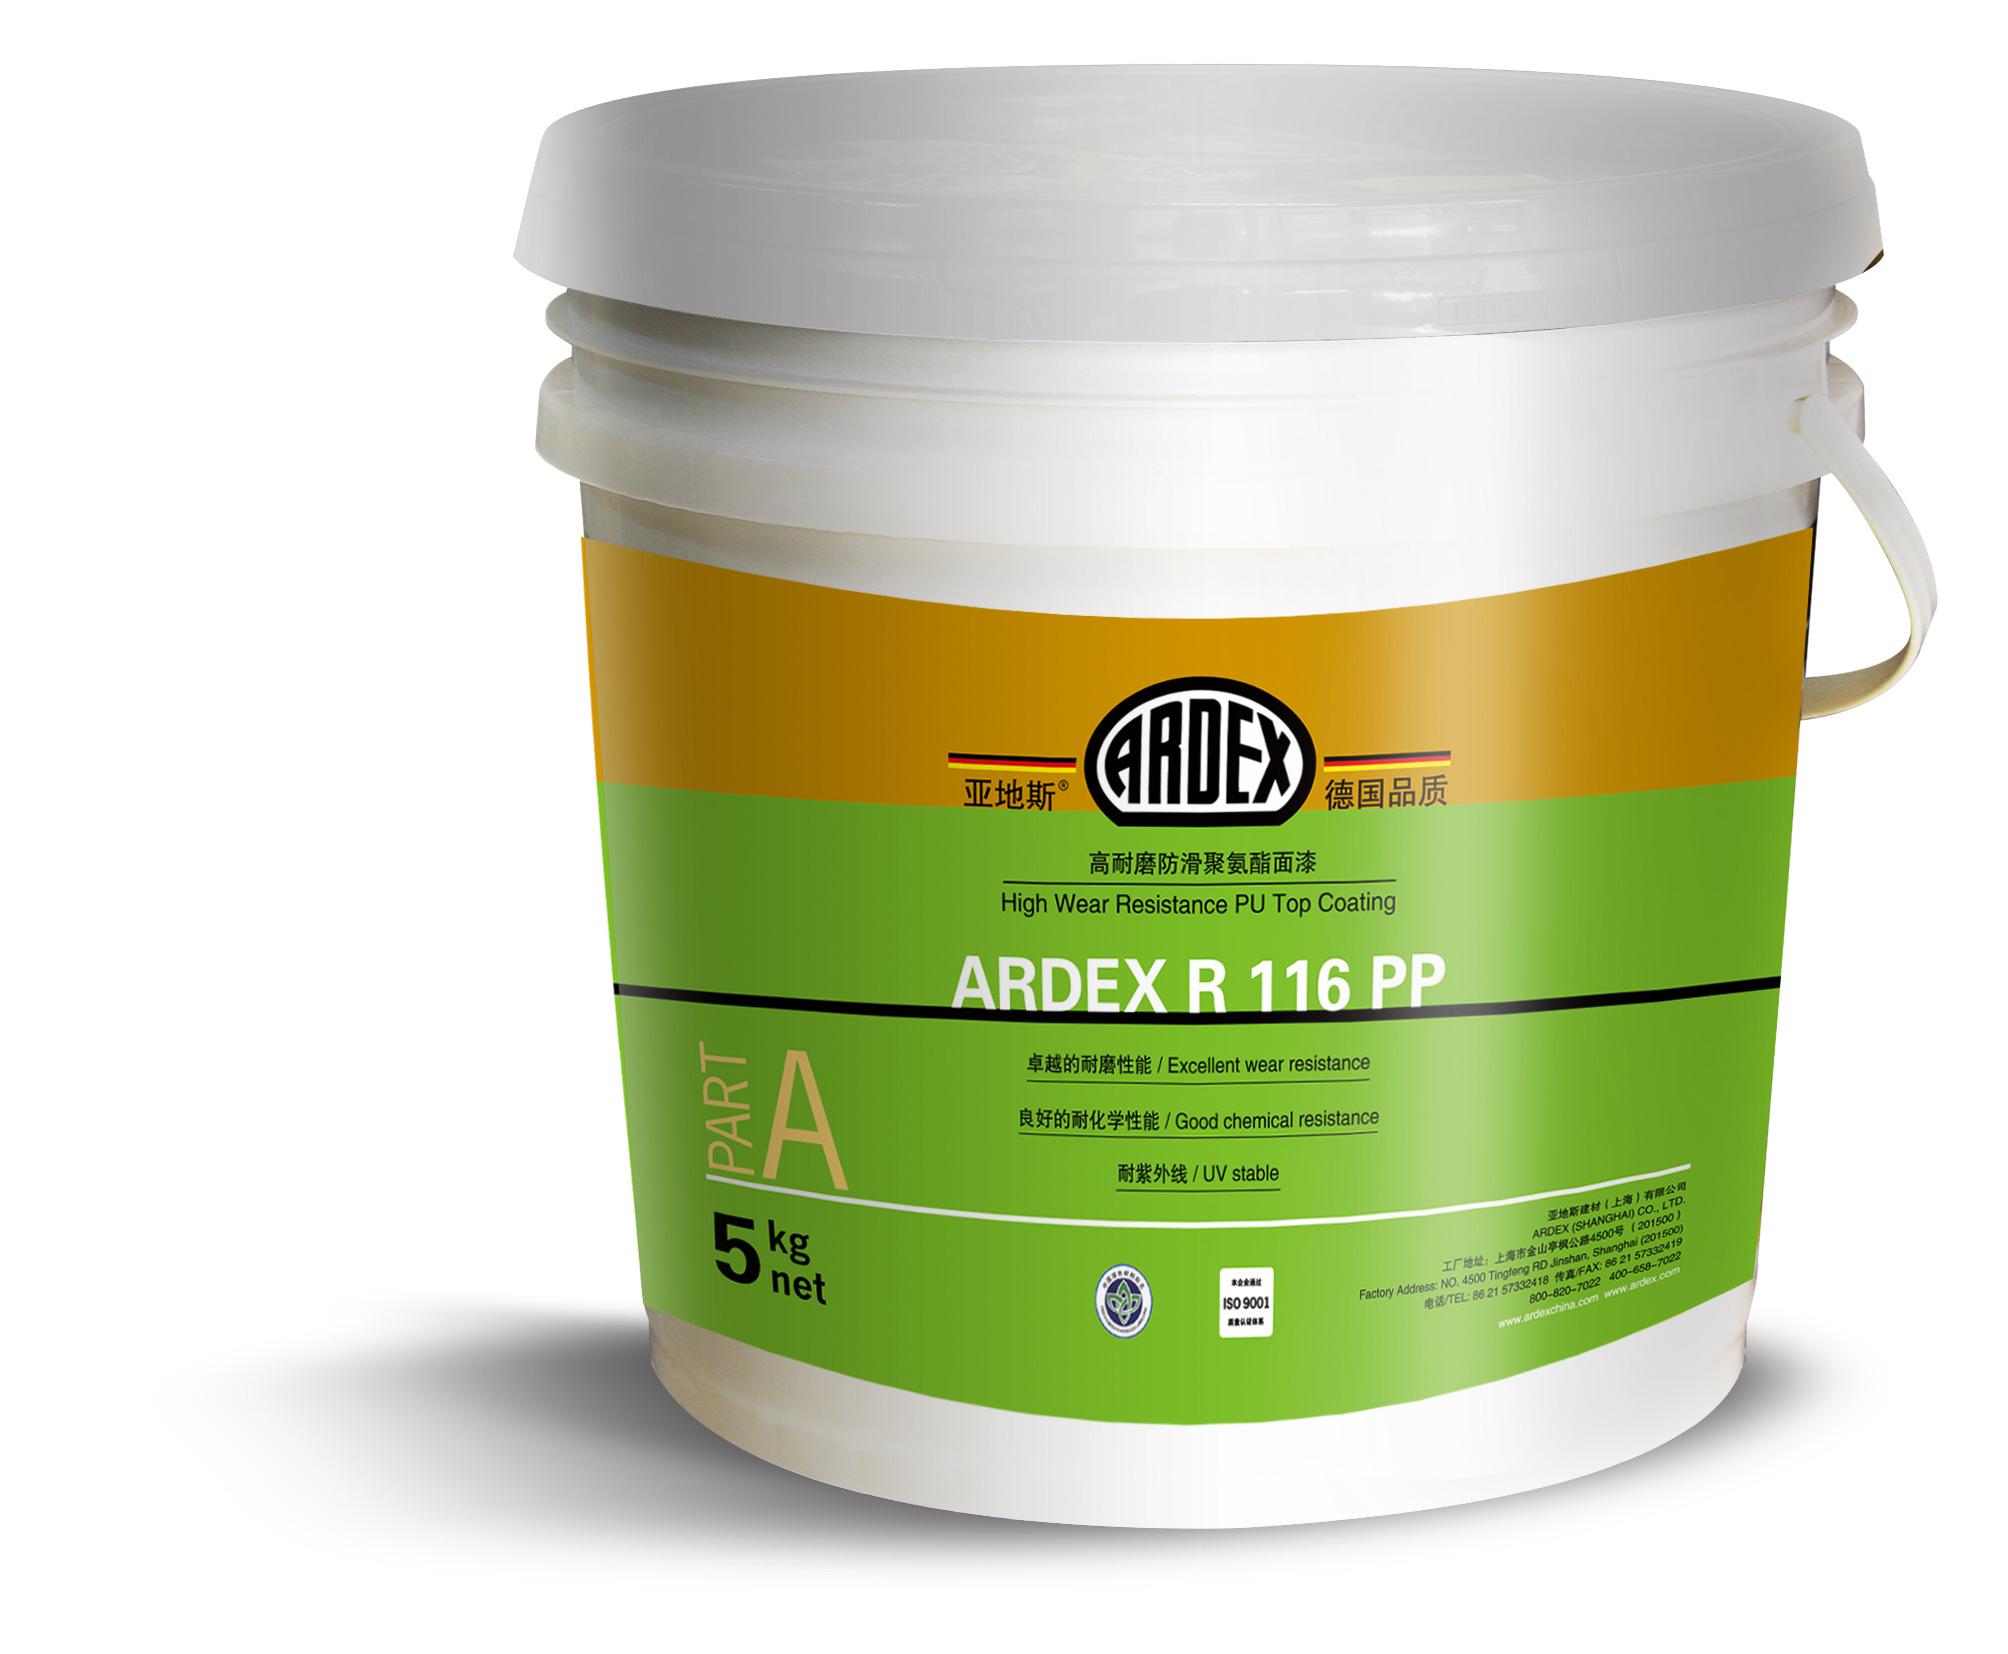 ARDEX R 116 PP